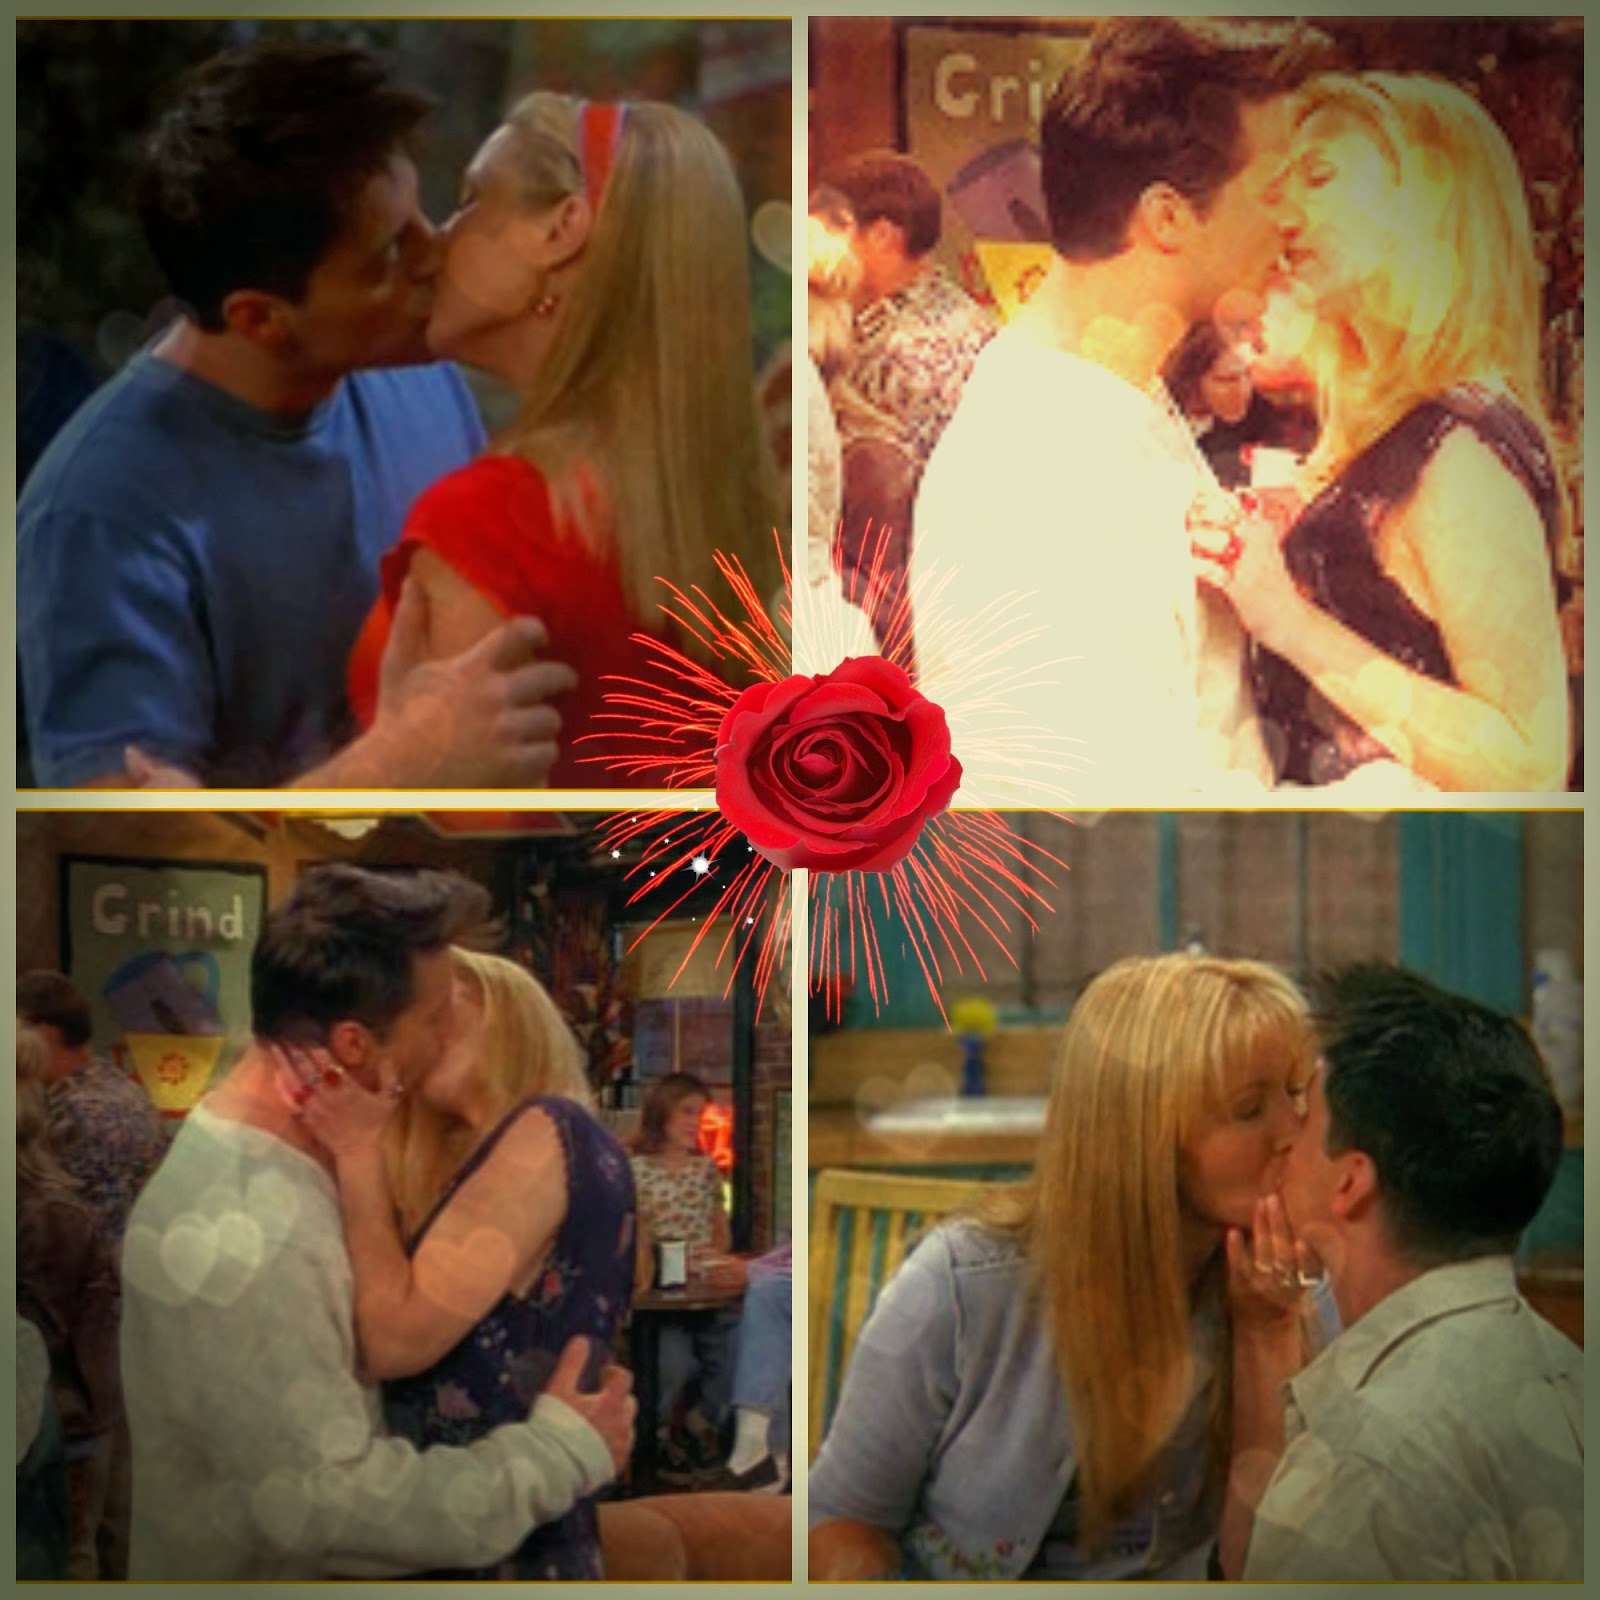 Besos de Joey y Phoebe de la serie Friends